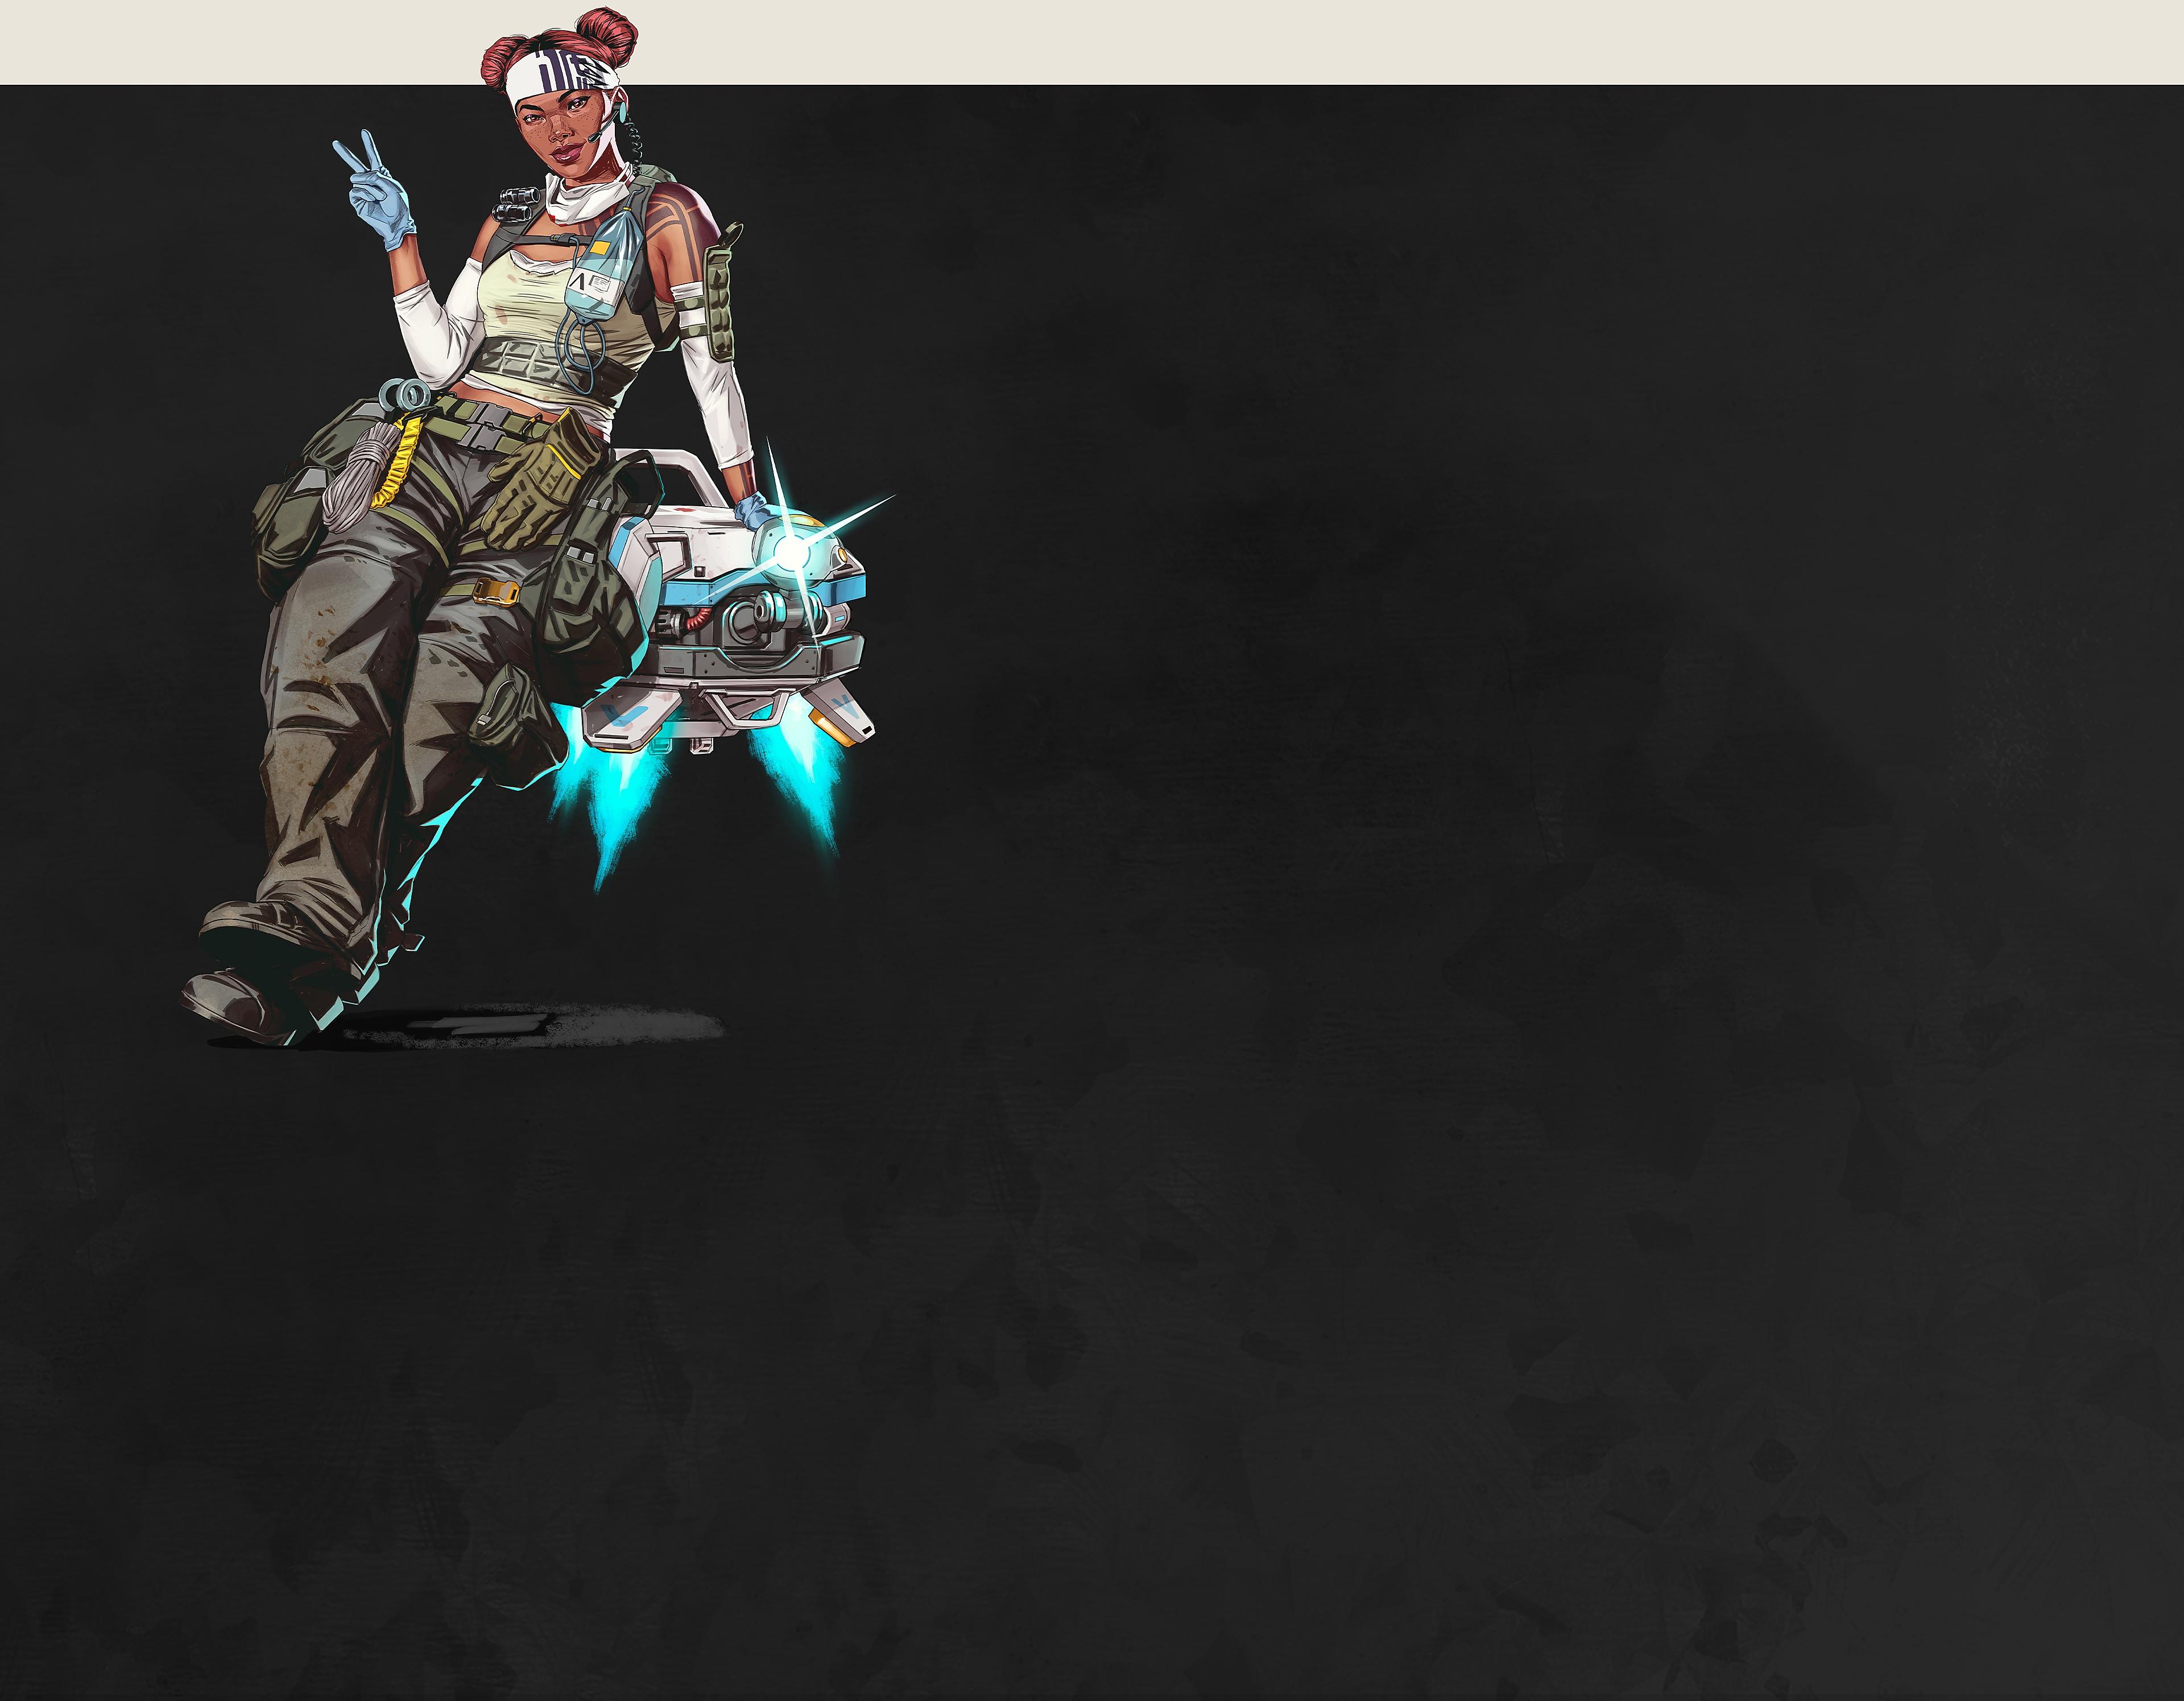 Combat section background image